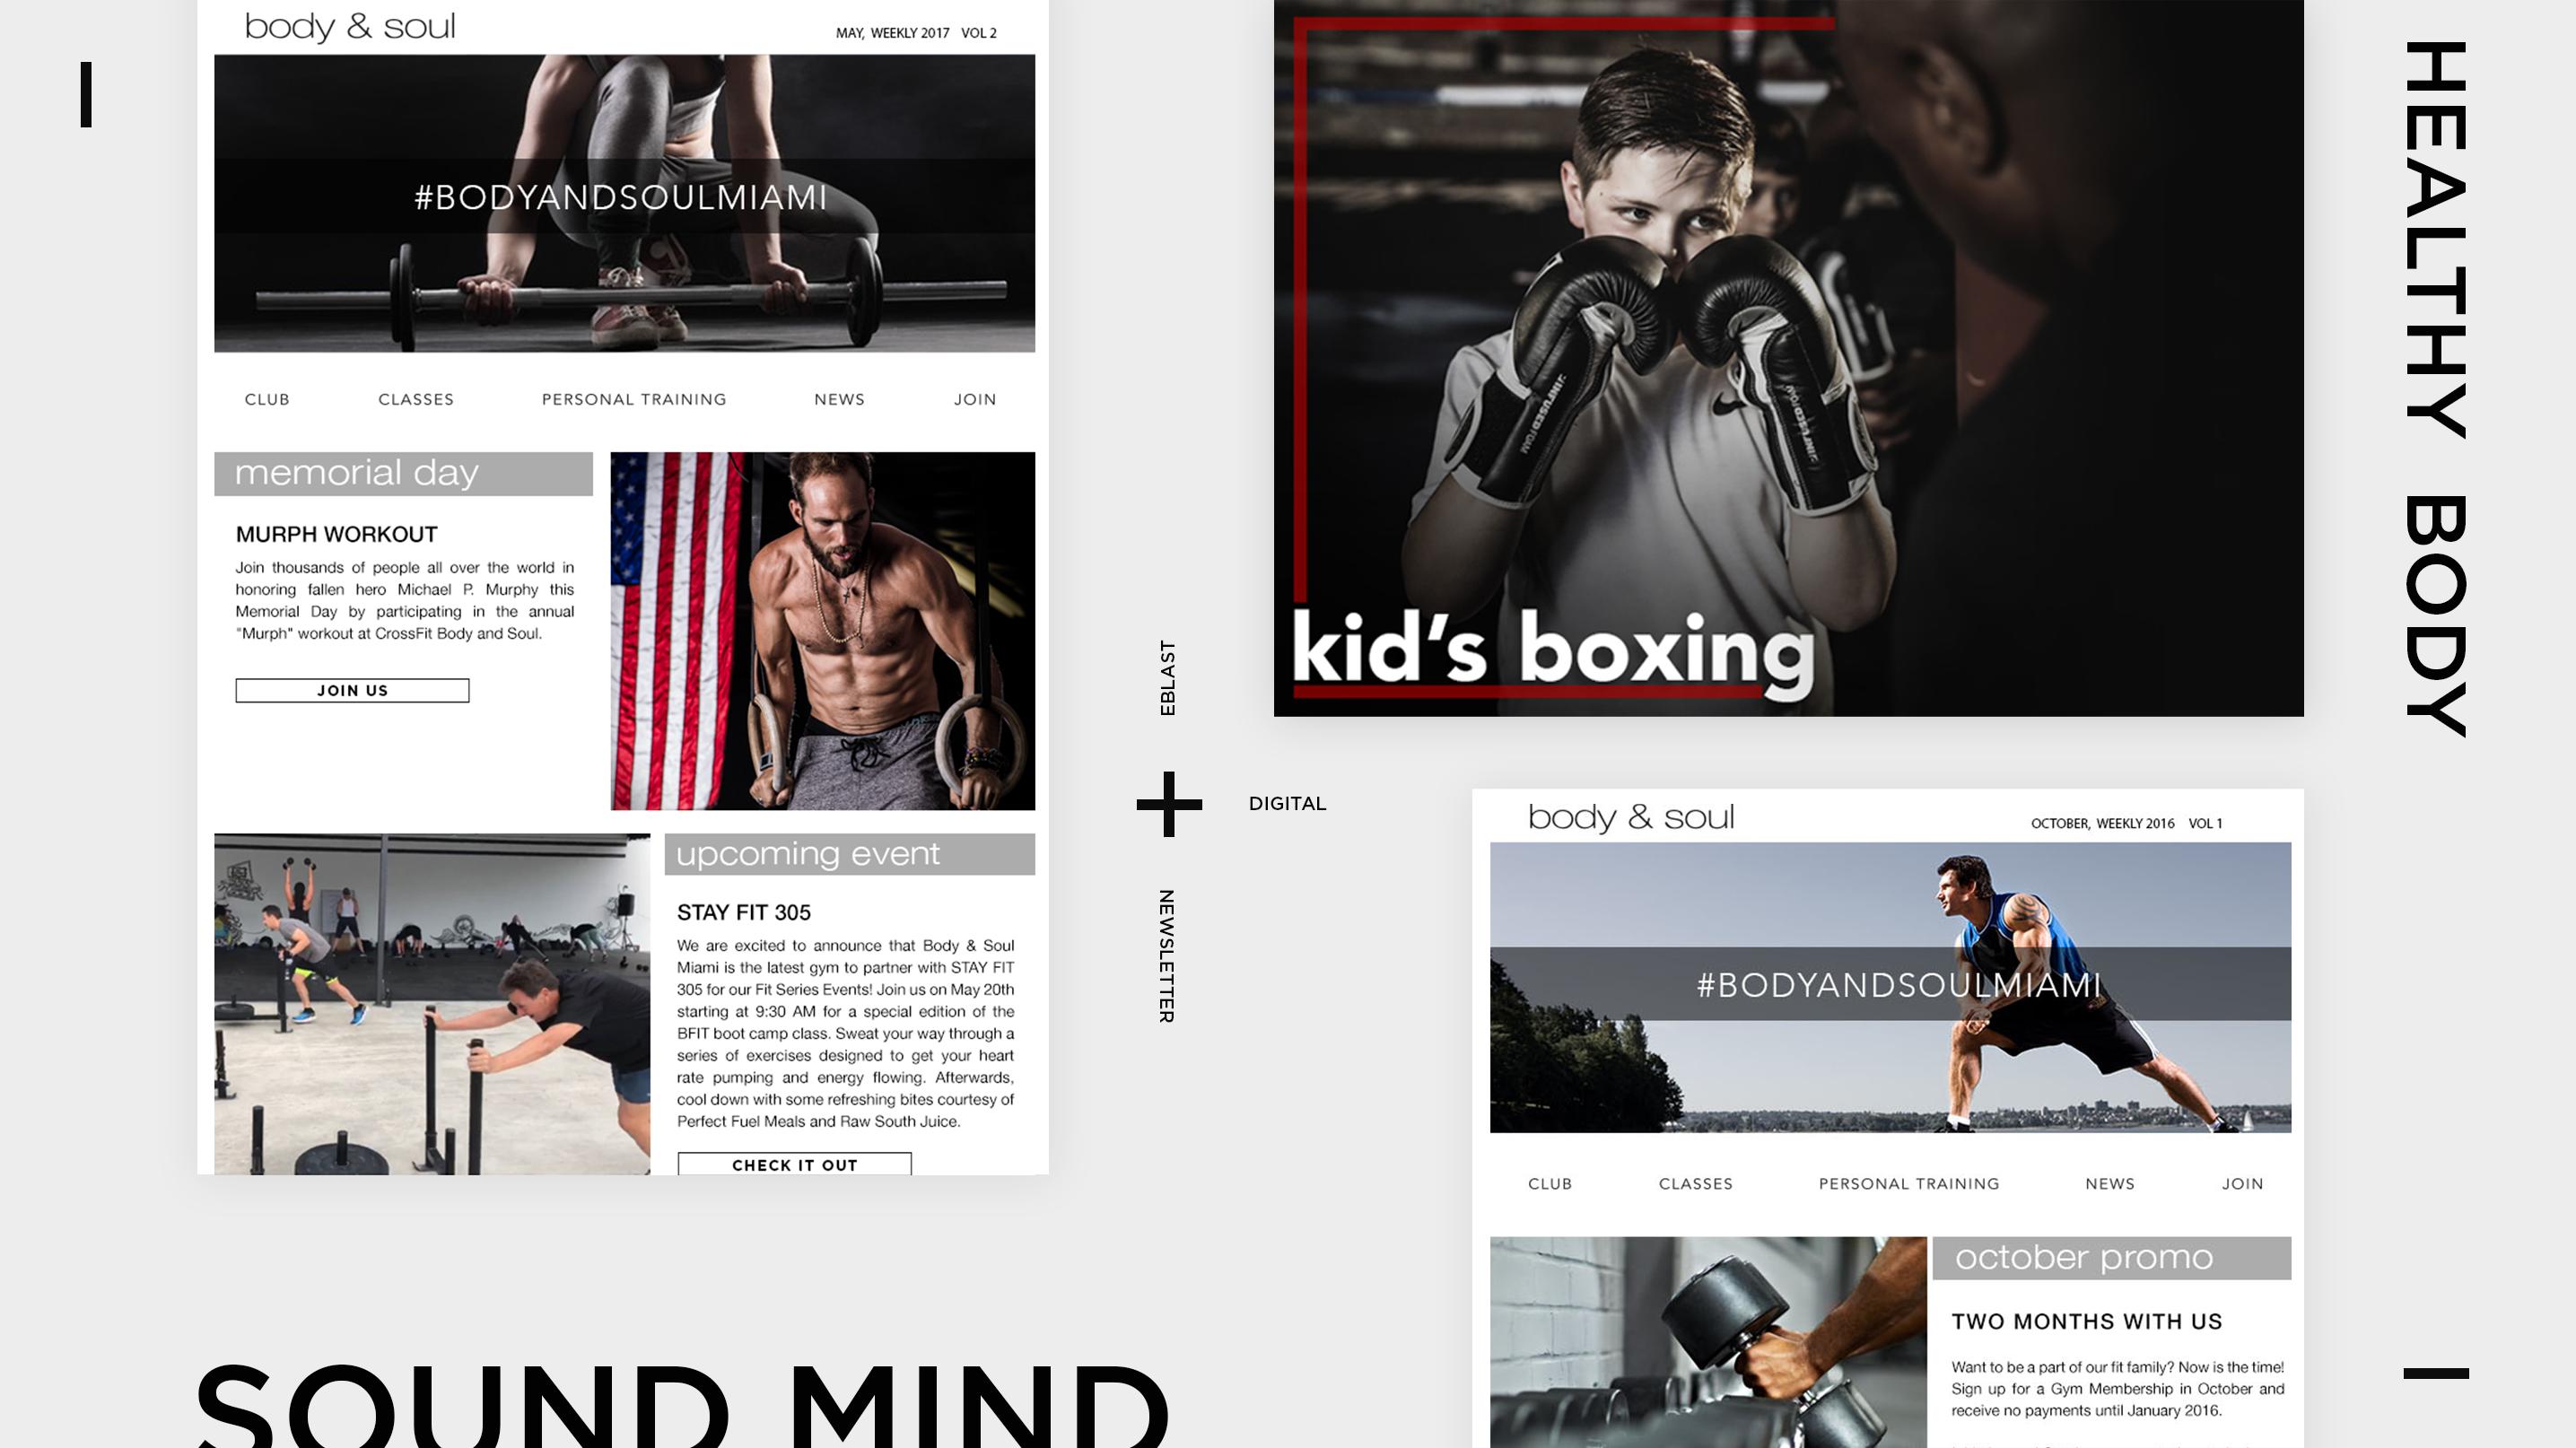 TBC---NL-Mockups---Body&Soul-Boxing-Social-Media-3